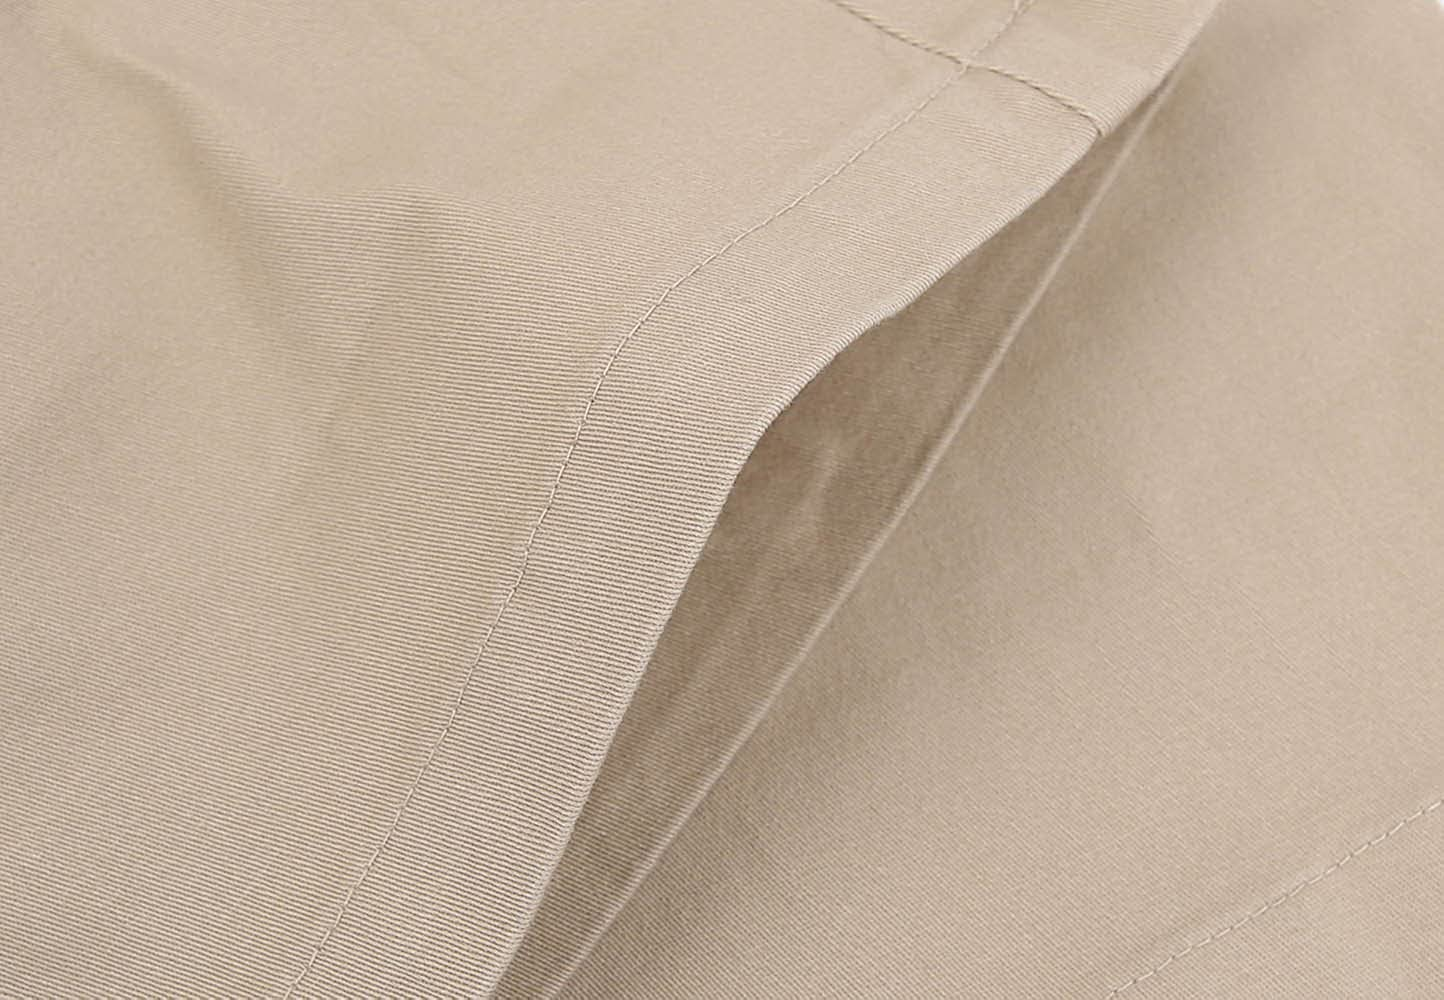 Bienzoe Girls School Uniforms Cotton Stretchy Twill Adjust Waist Flat Front Pants